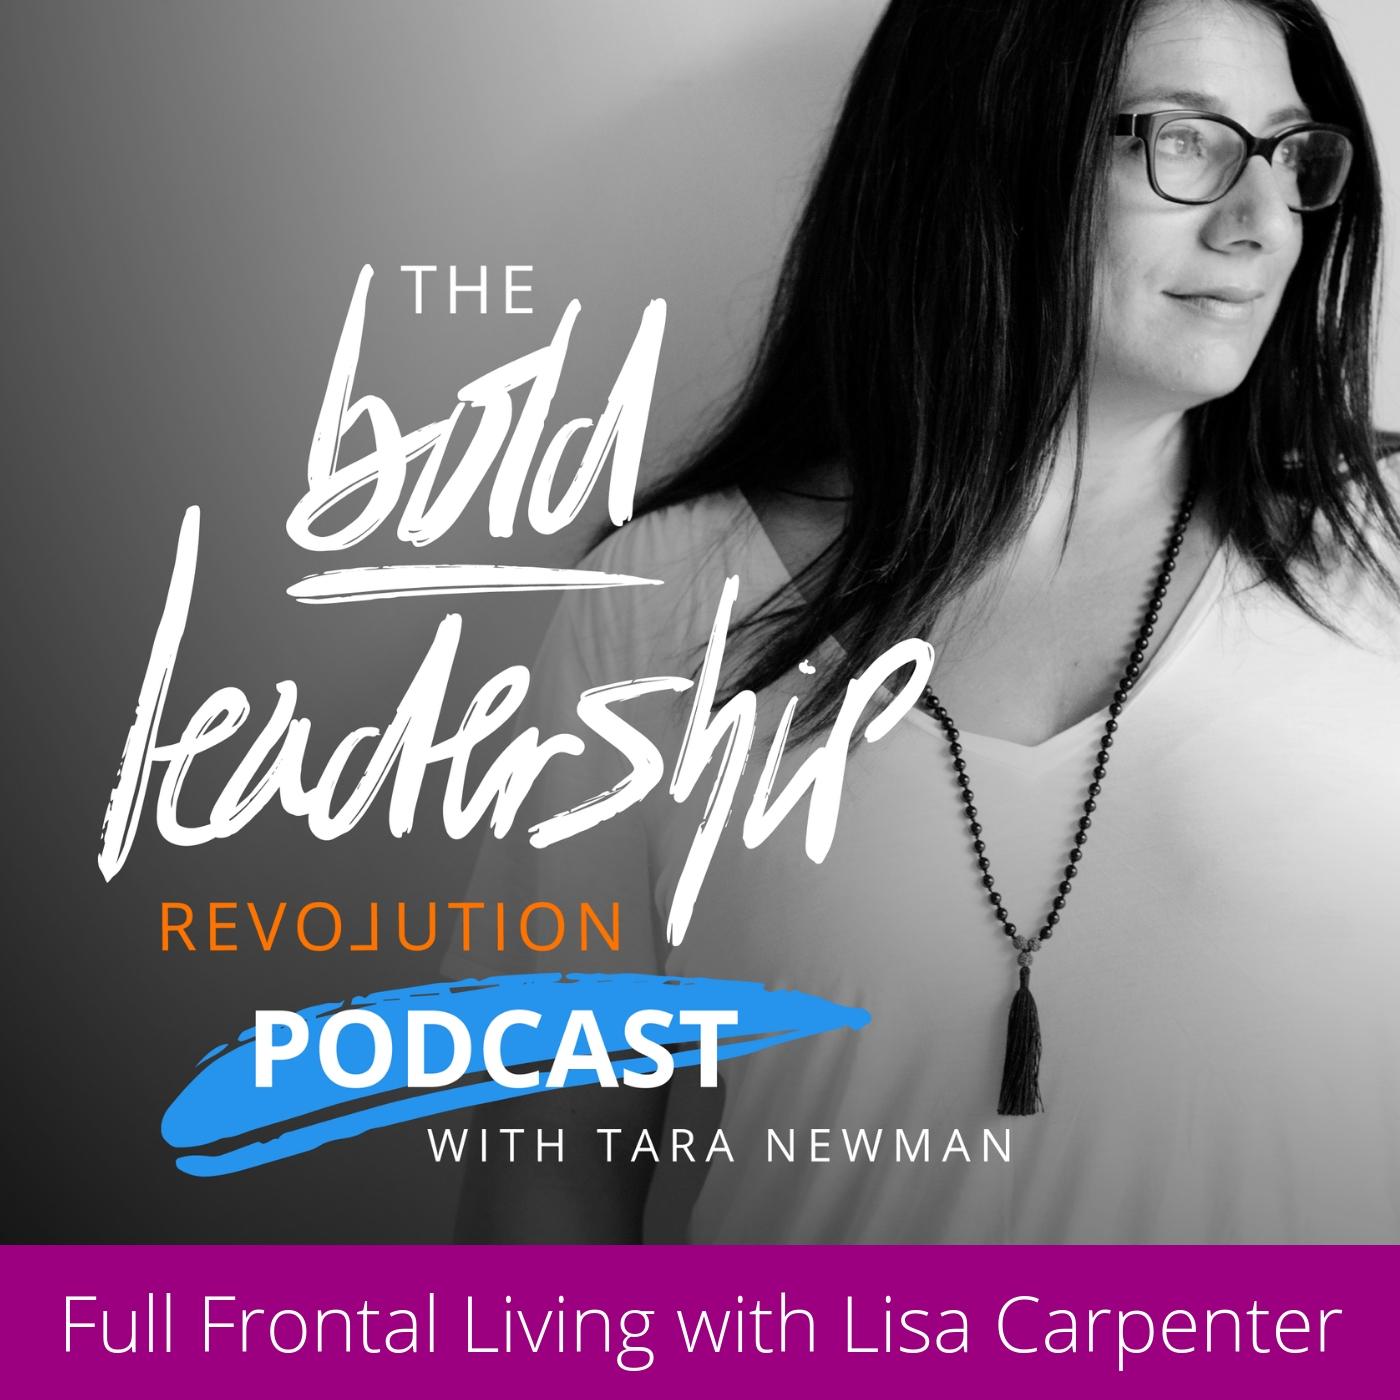 Full Frontal Living with Lisa Carpenter